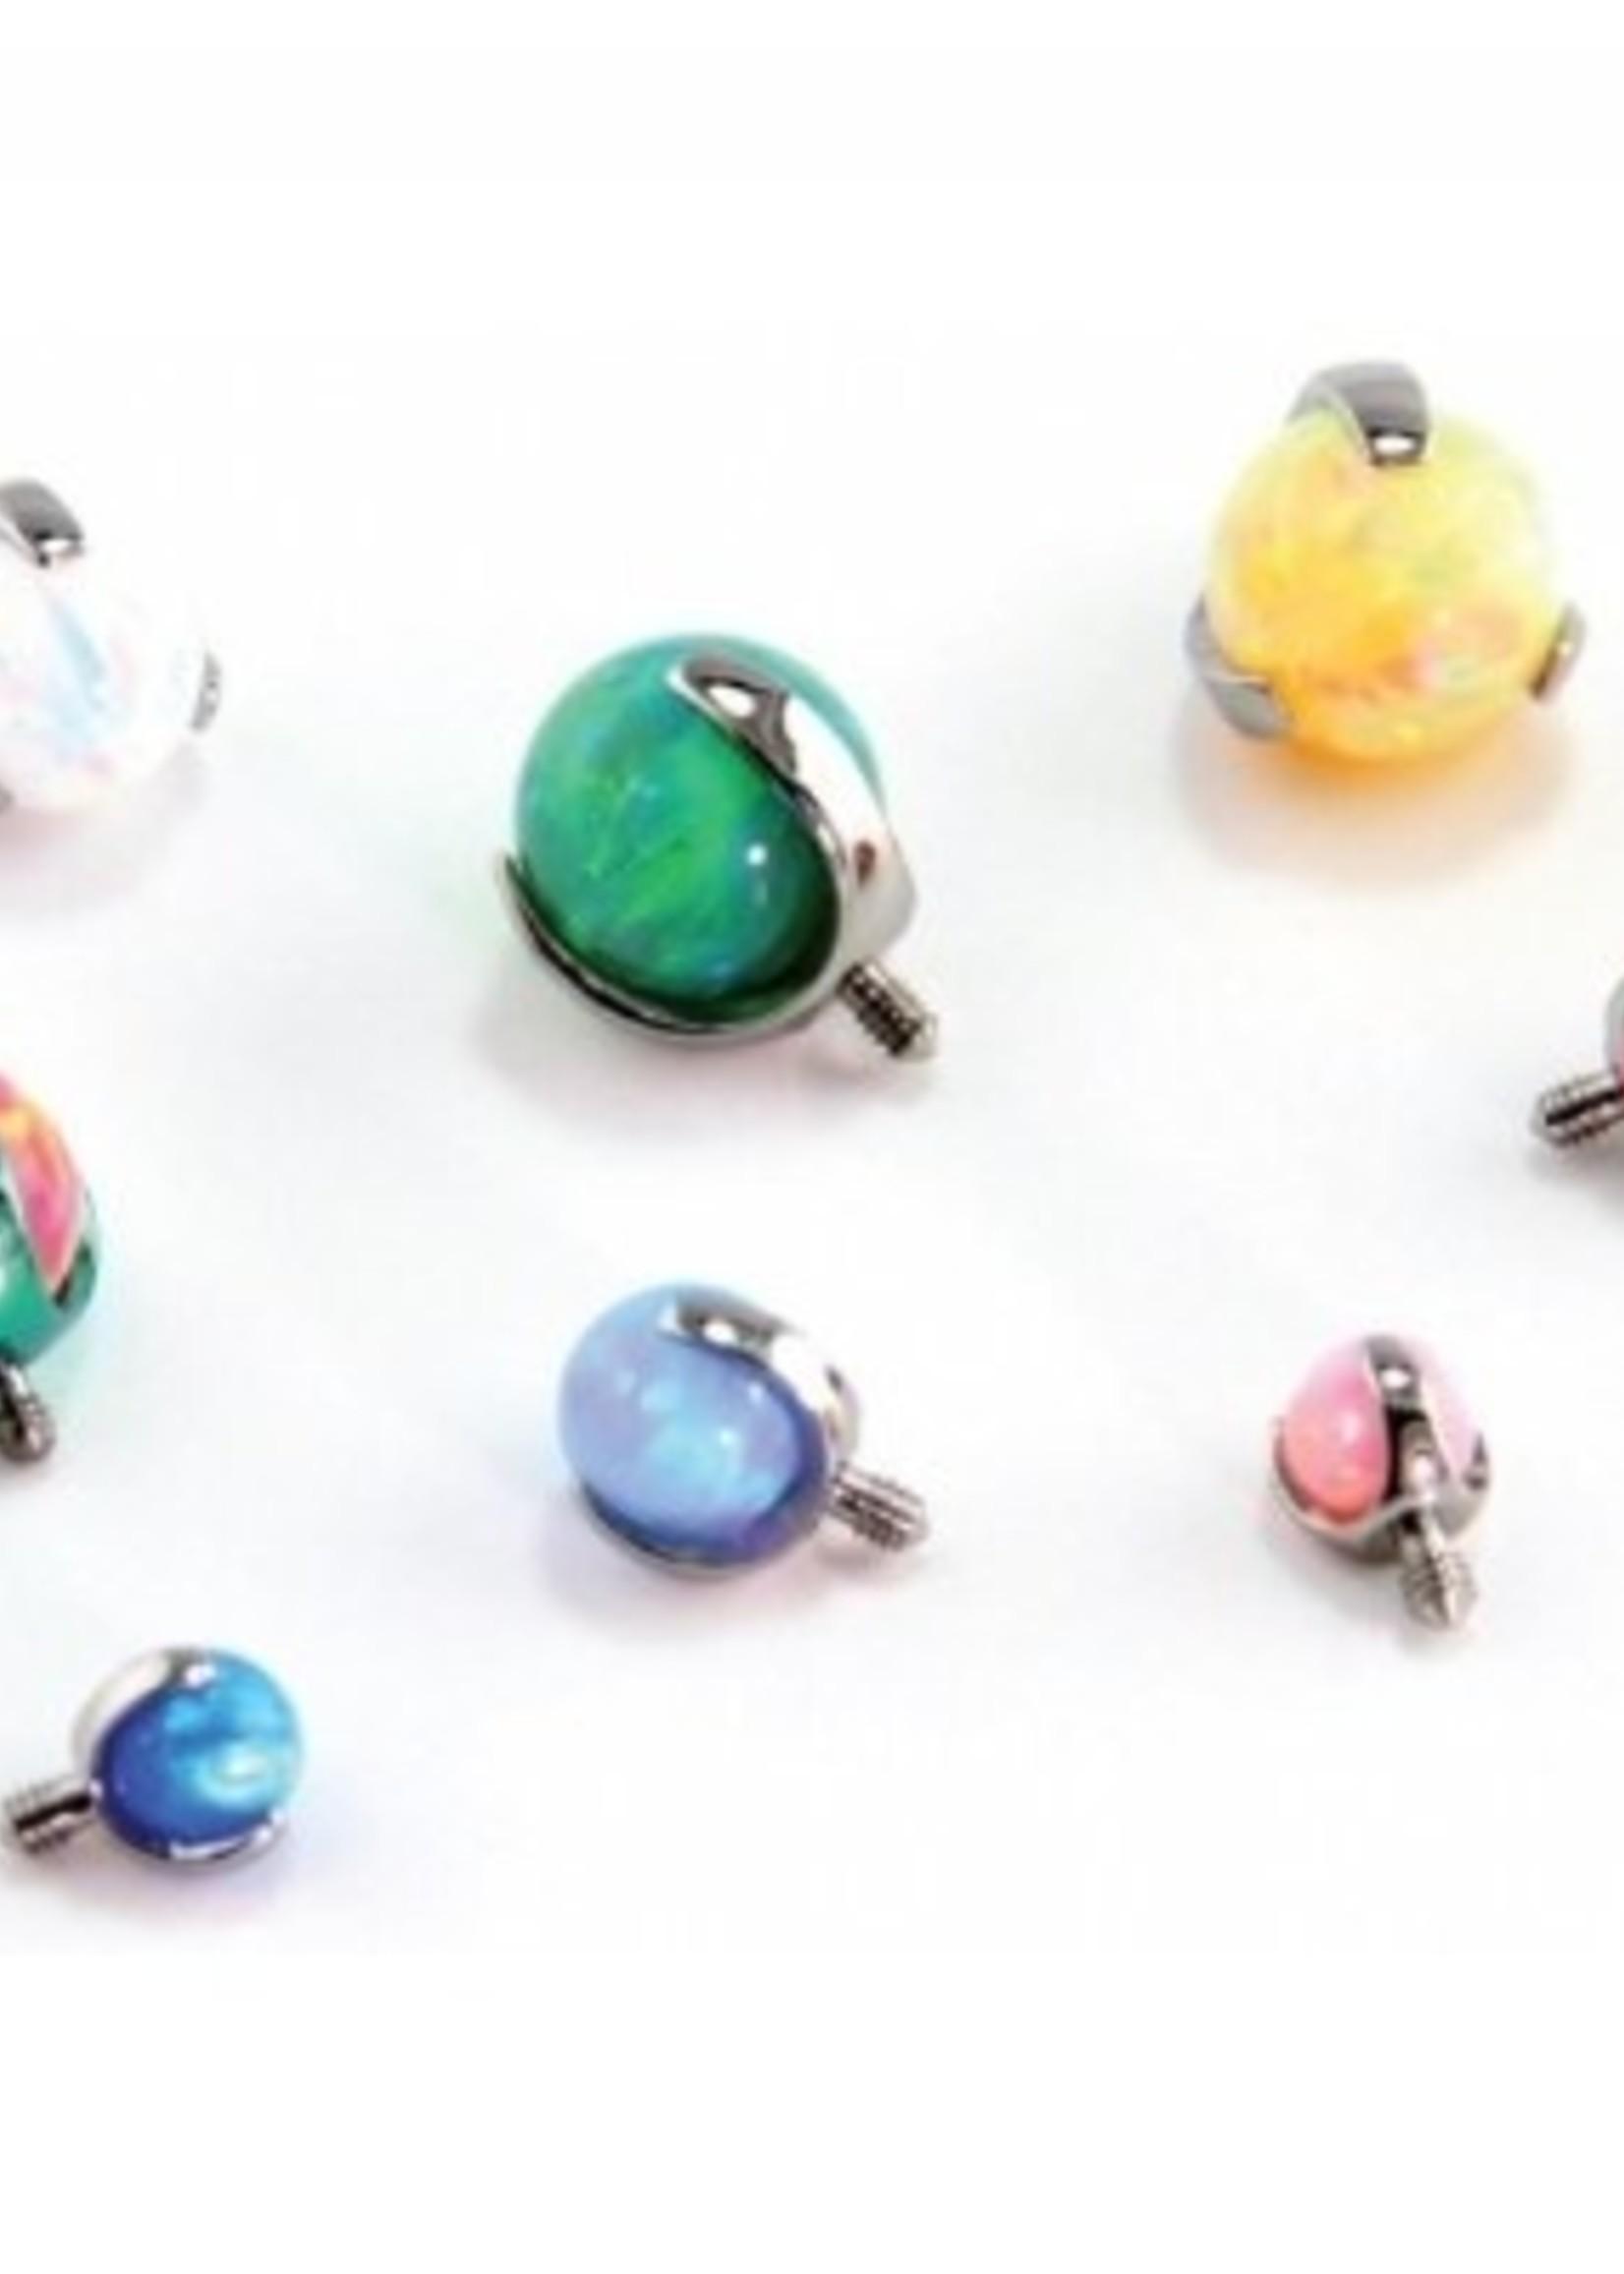 14g 3-prong Opal Threaded Ends